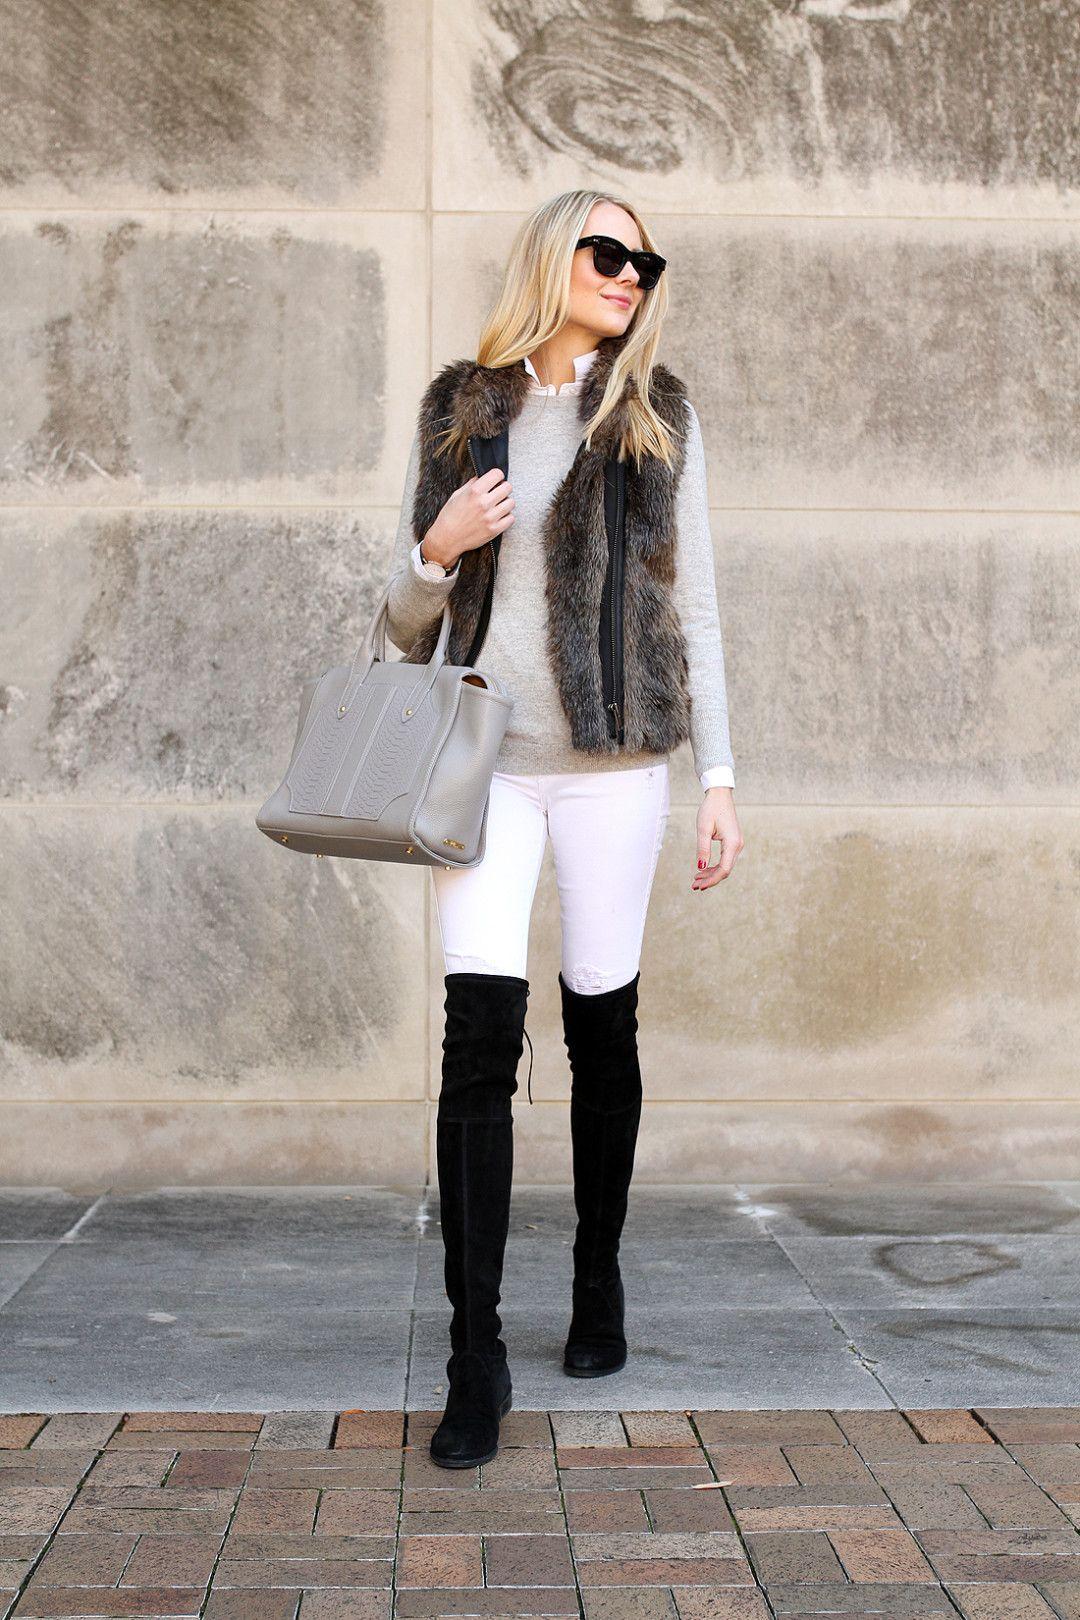 722af65b255 Boots Over Jeans · Fashion-jackson-faux-fur-vest-white-skinny-jeans-